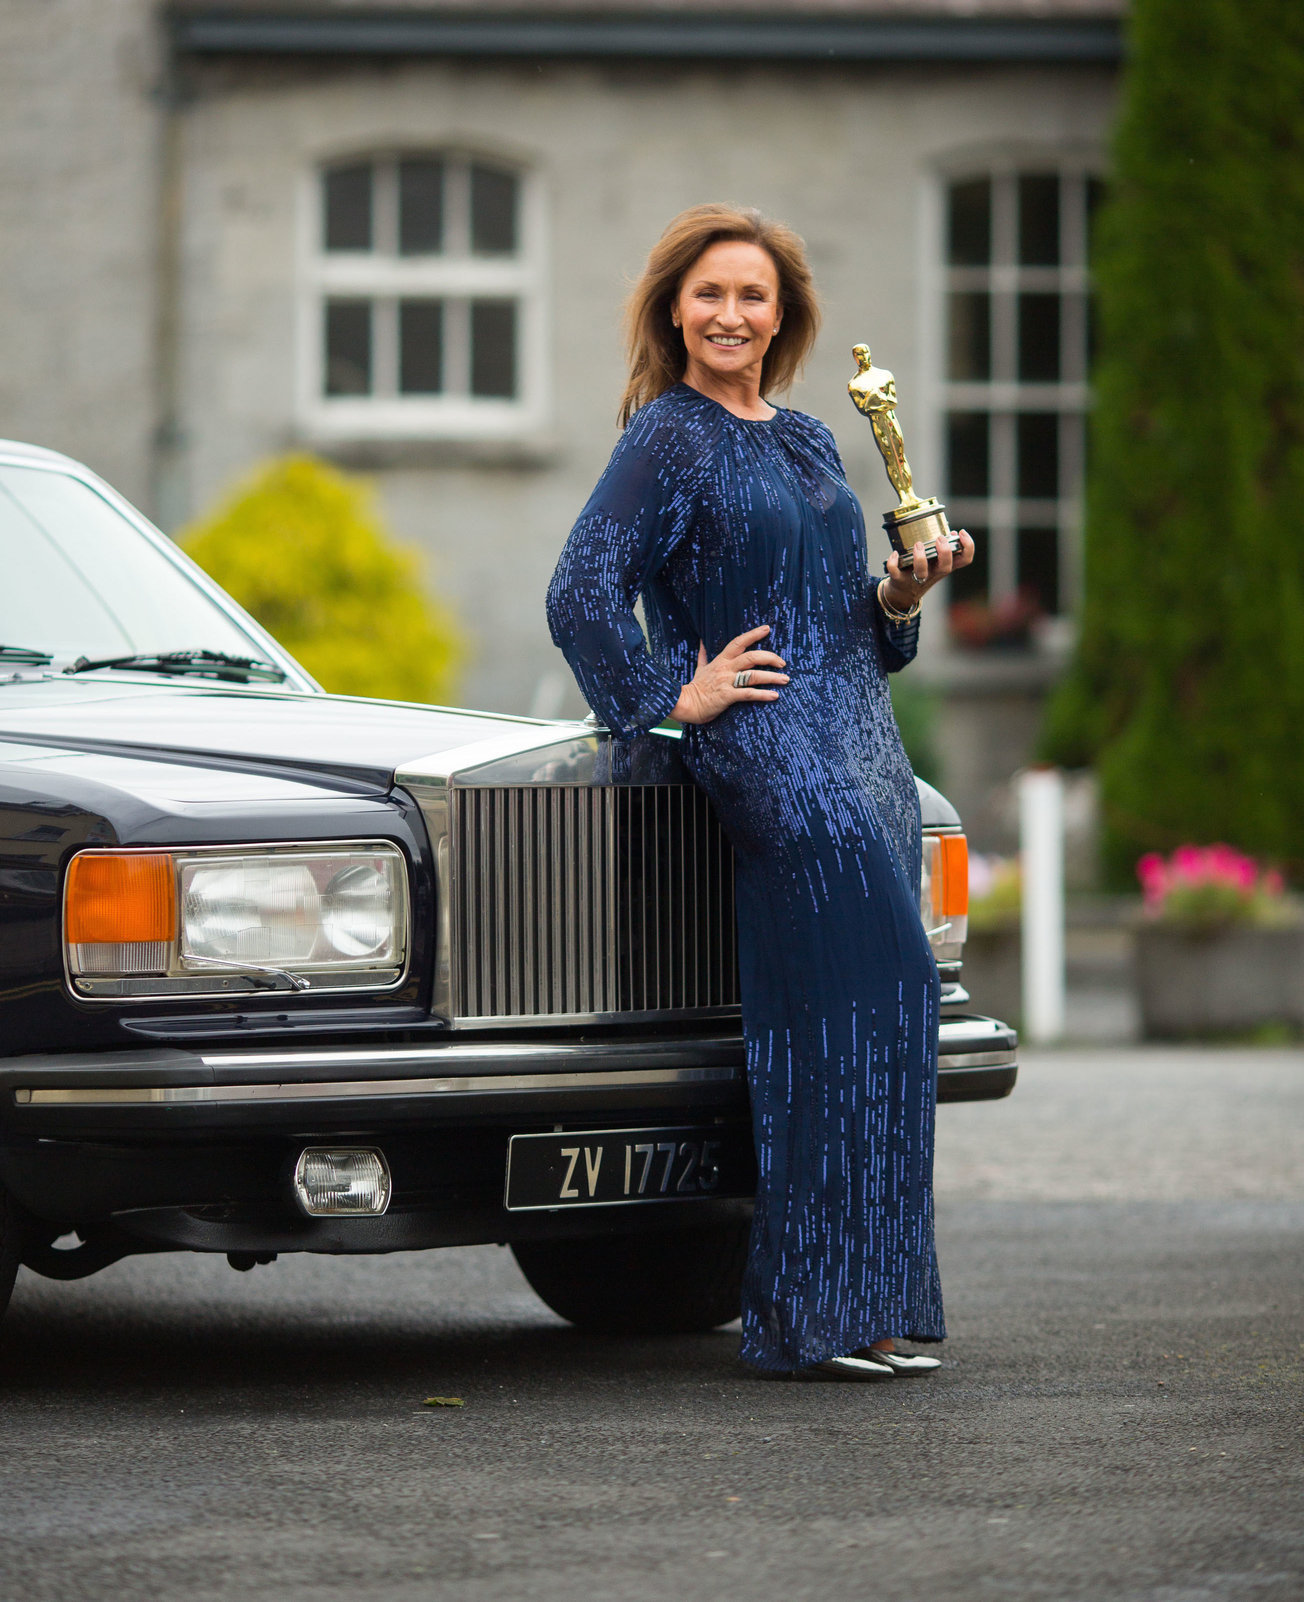 Maureen O Hara comes to Foynes